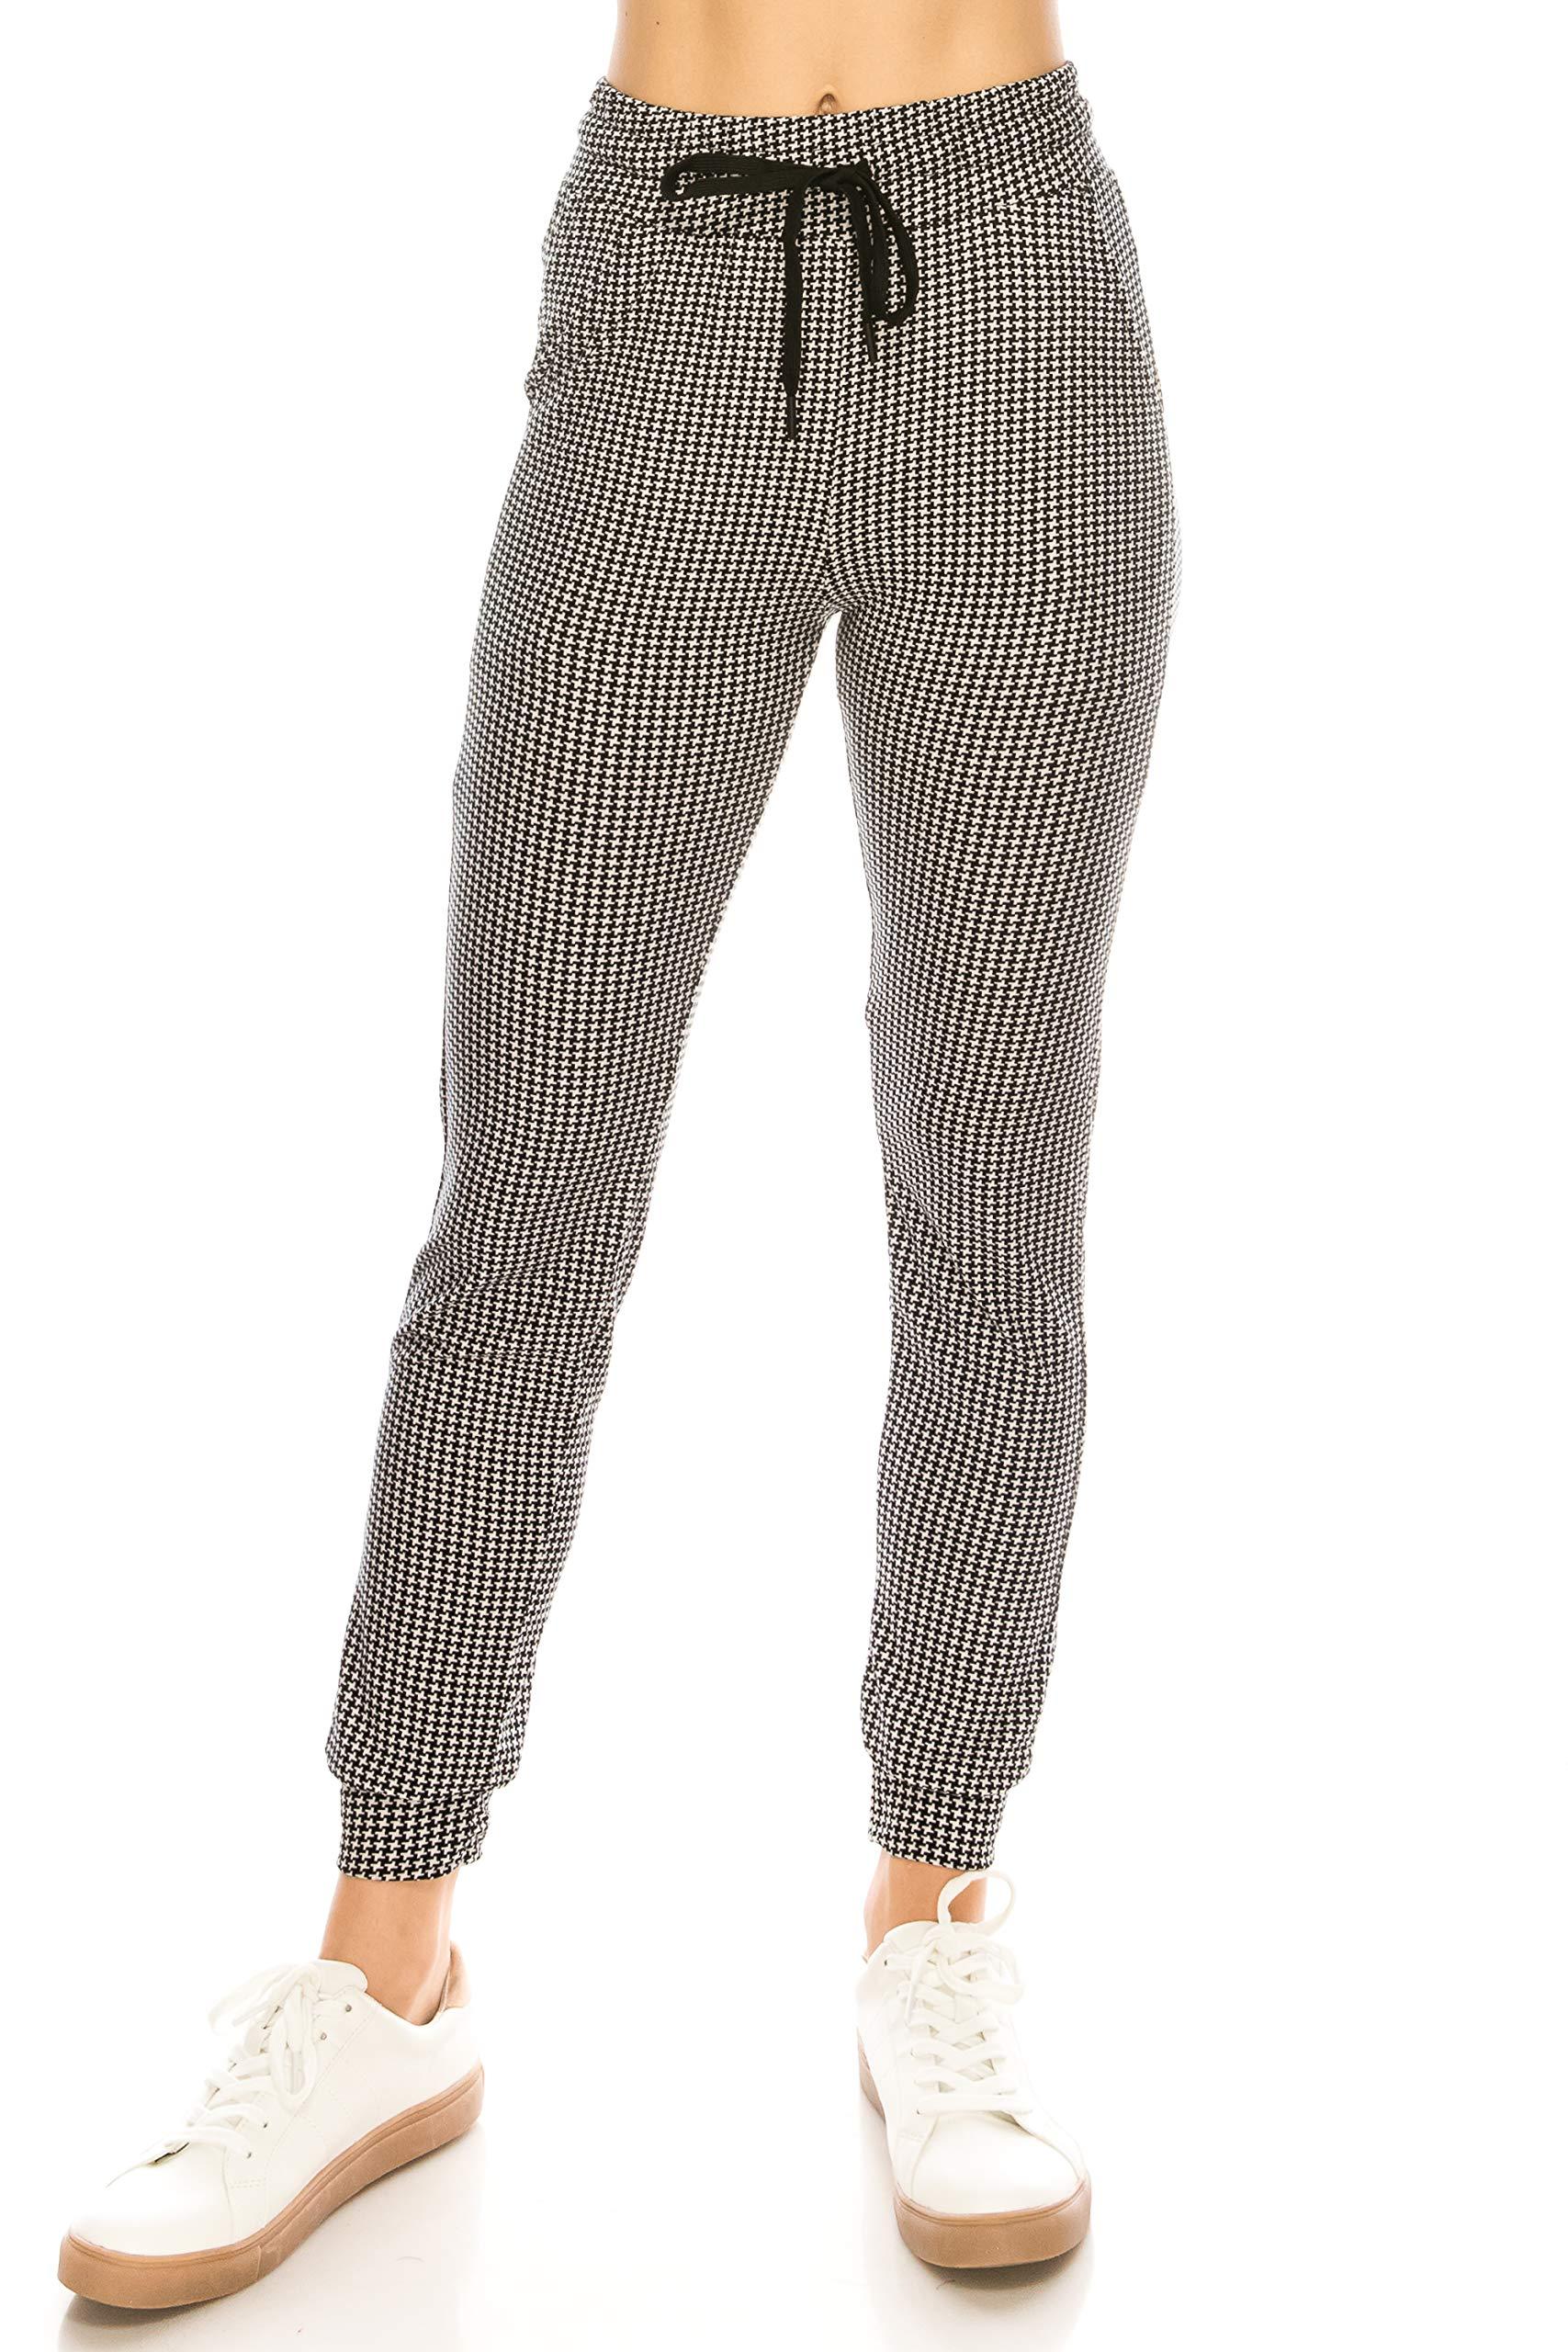 ALWAYS Women Drawstrings Jogger Sweatpants - Skinny Fit Premium Soft Stretch Plaid Checkered Pockets Track Pants Black White L/XL